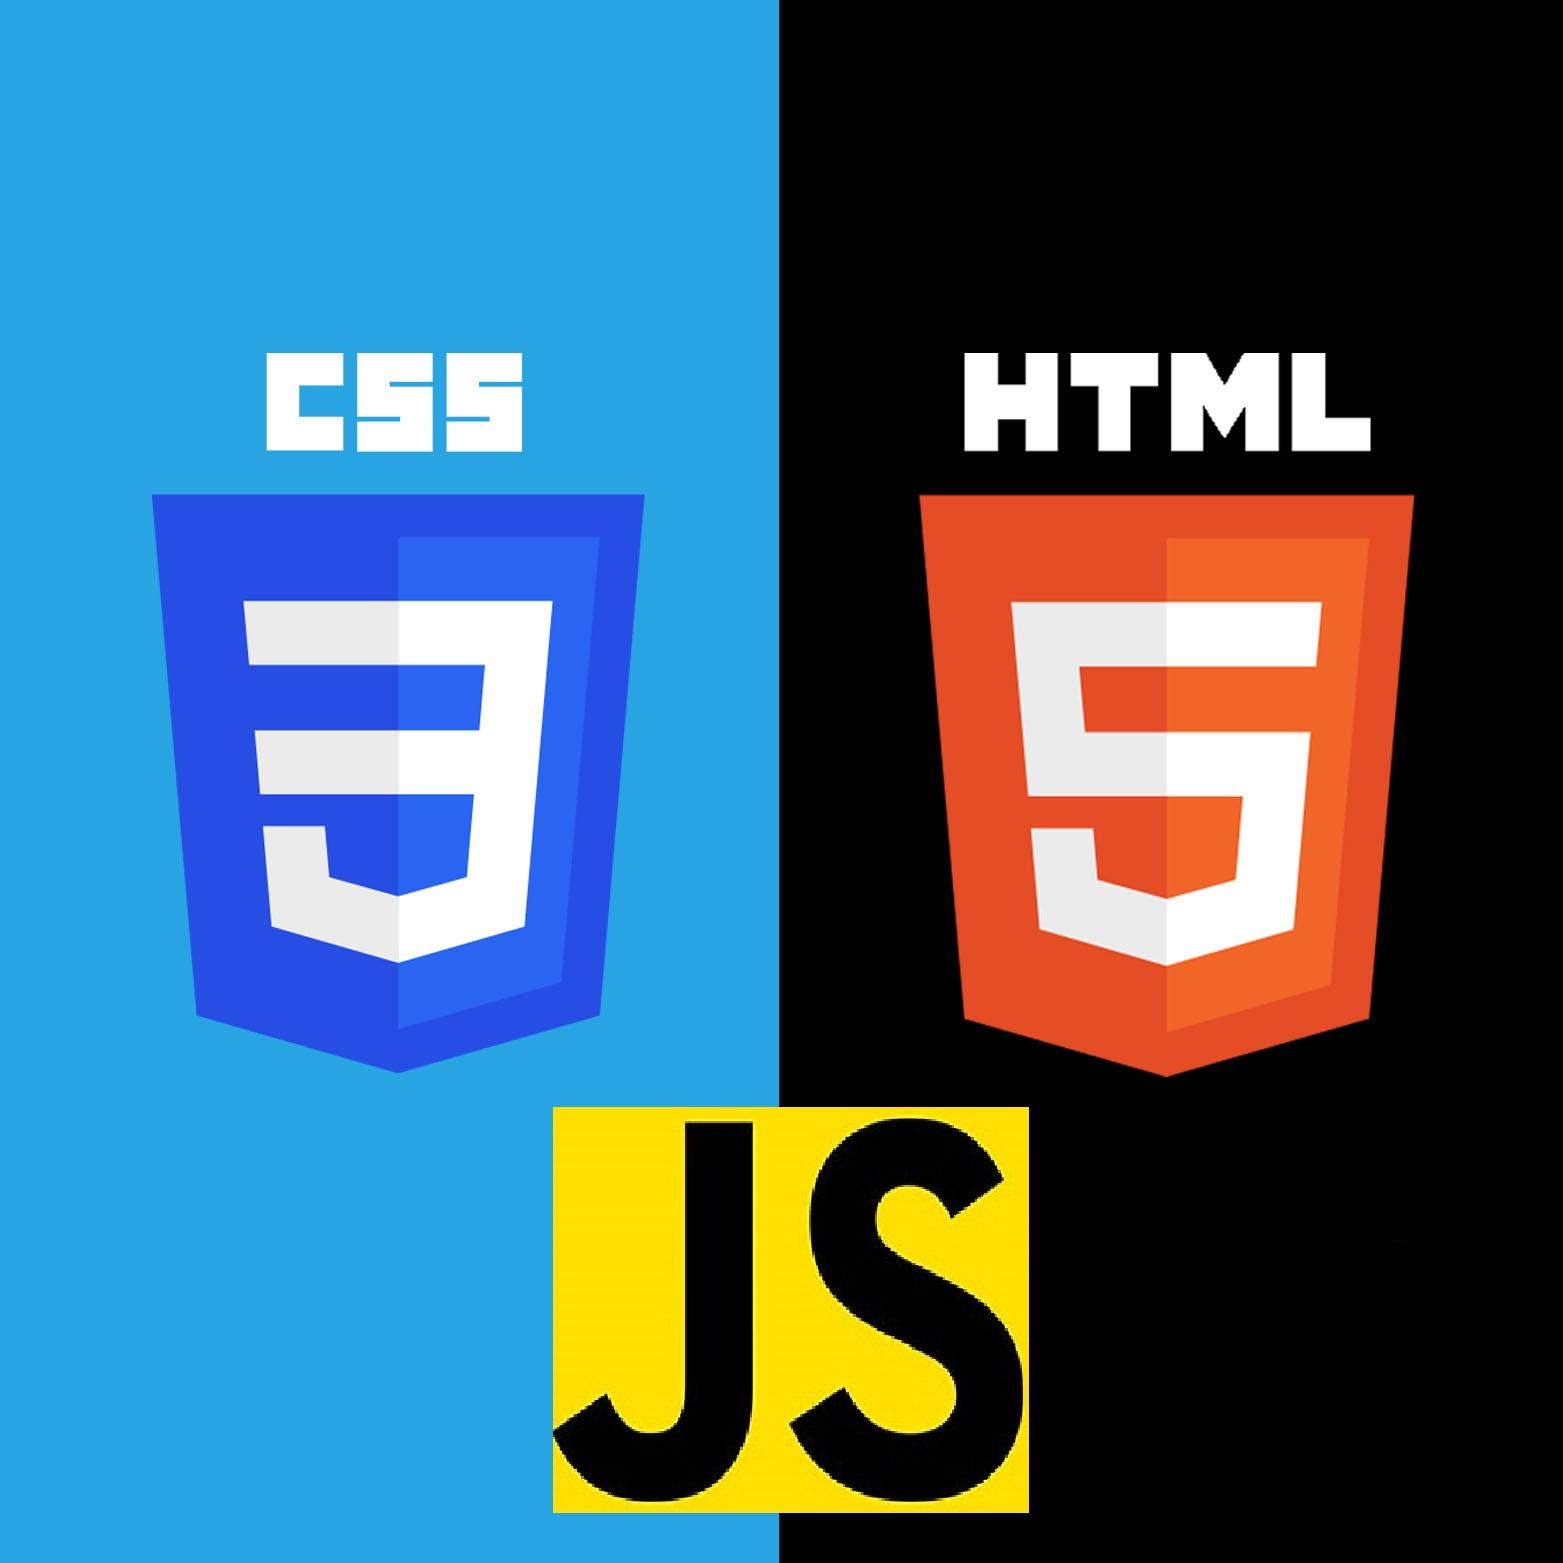 Udemy Español: 6 Cursos JavaScript, CSS, HTML5, facturacion e inventario C#, Brilliant StartUp etc. + Libros